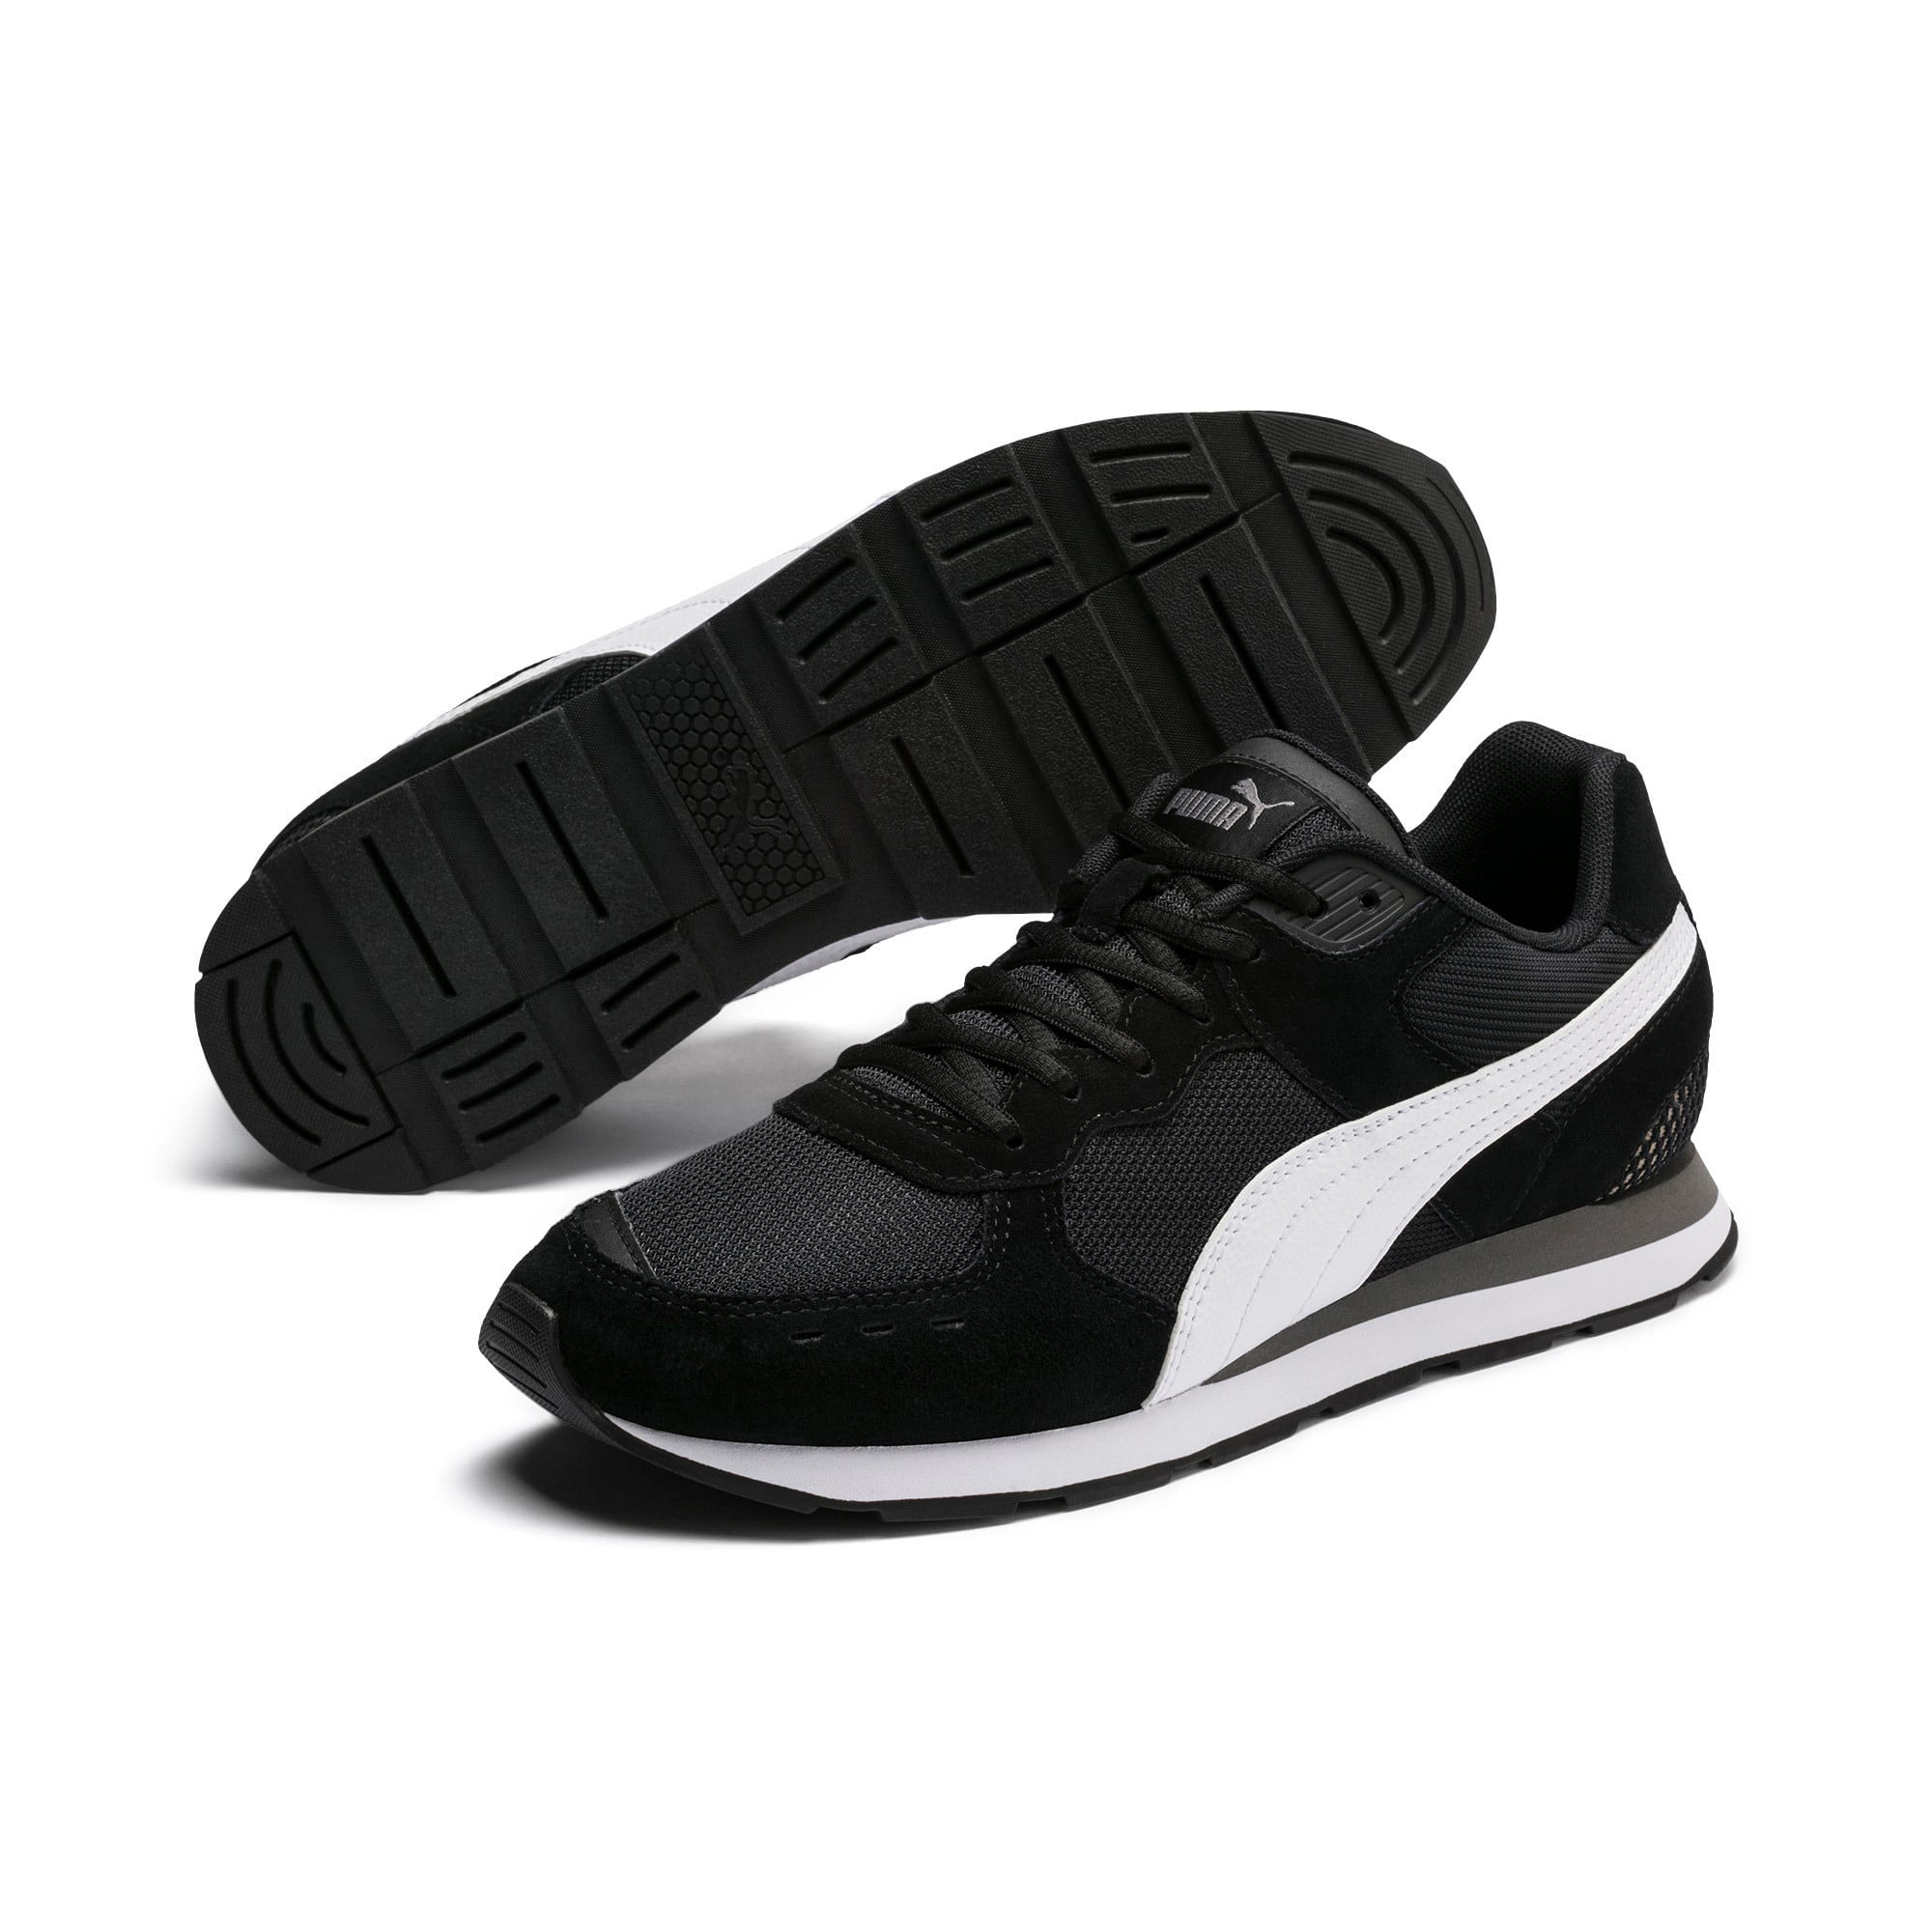 Miniatura 3 de Zapatos deportivos Vista, Black-White-Charcoal Gray, mediano